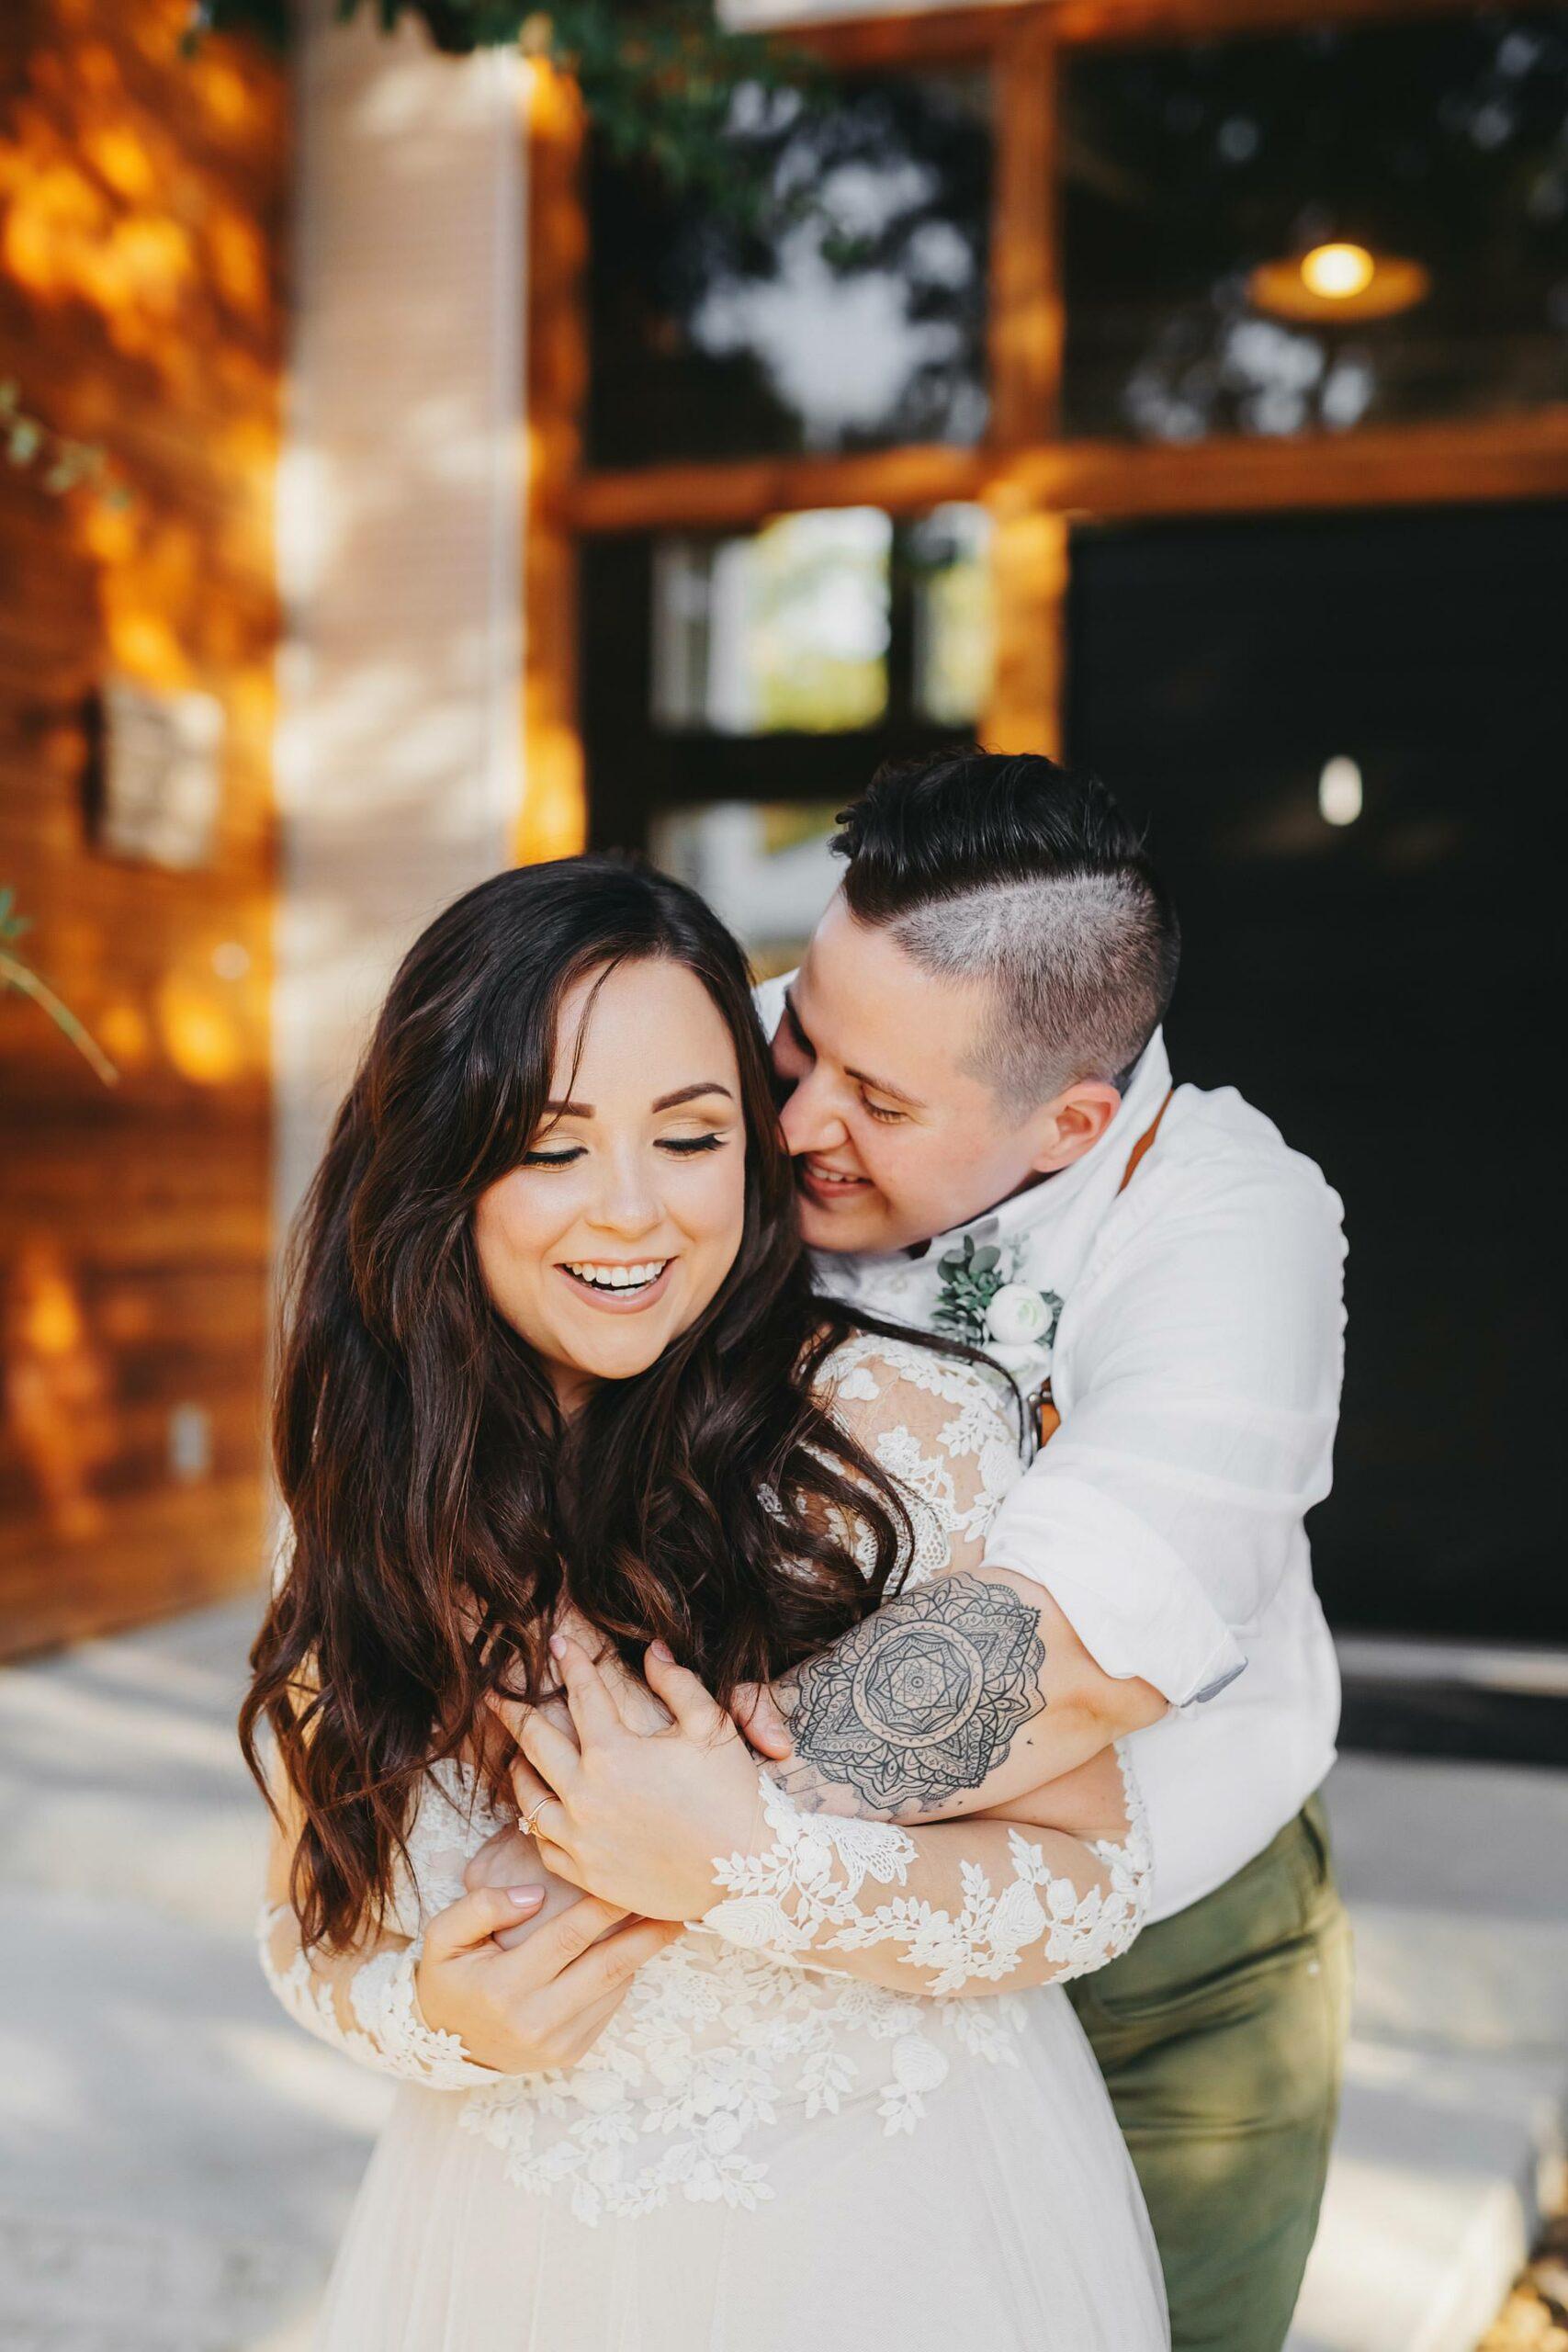 Megan-The-Photographer-Megan-Emerick-Photography-Austin-Wedding-Photographers